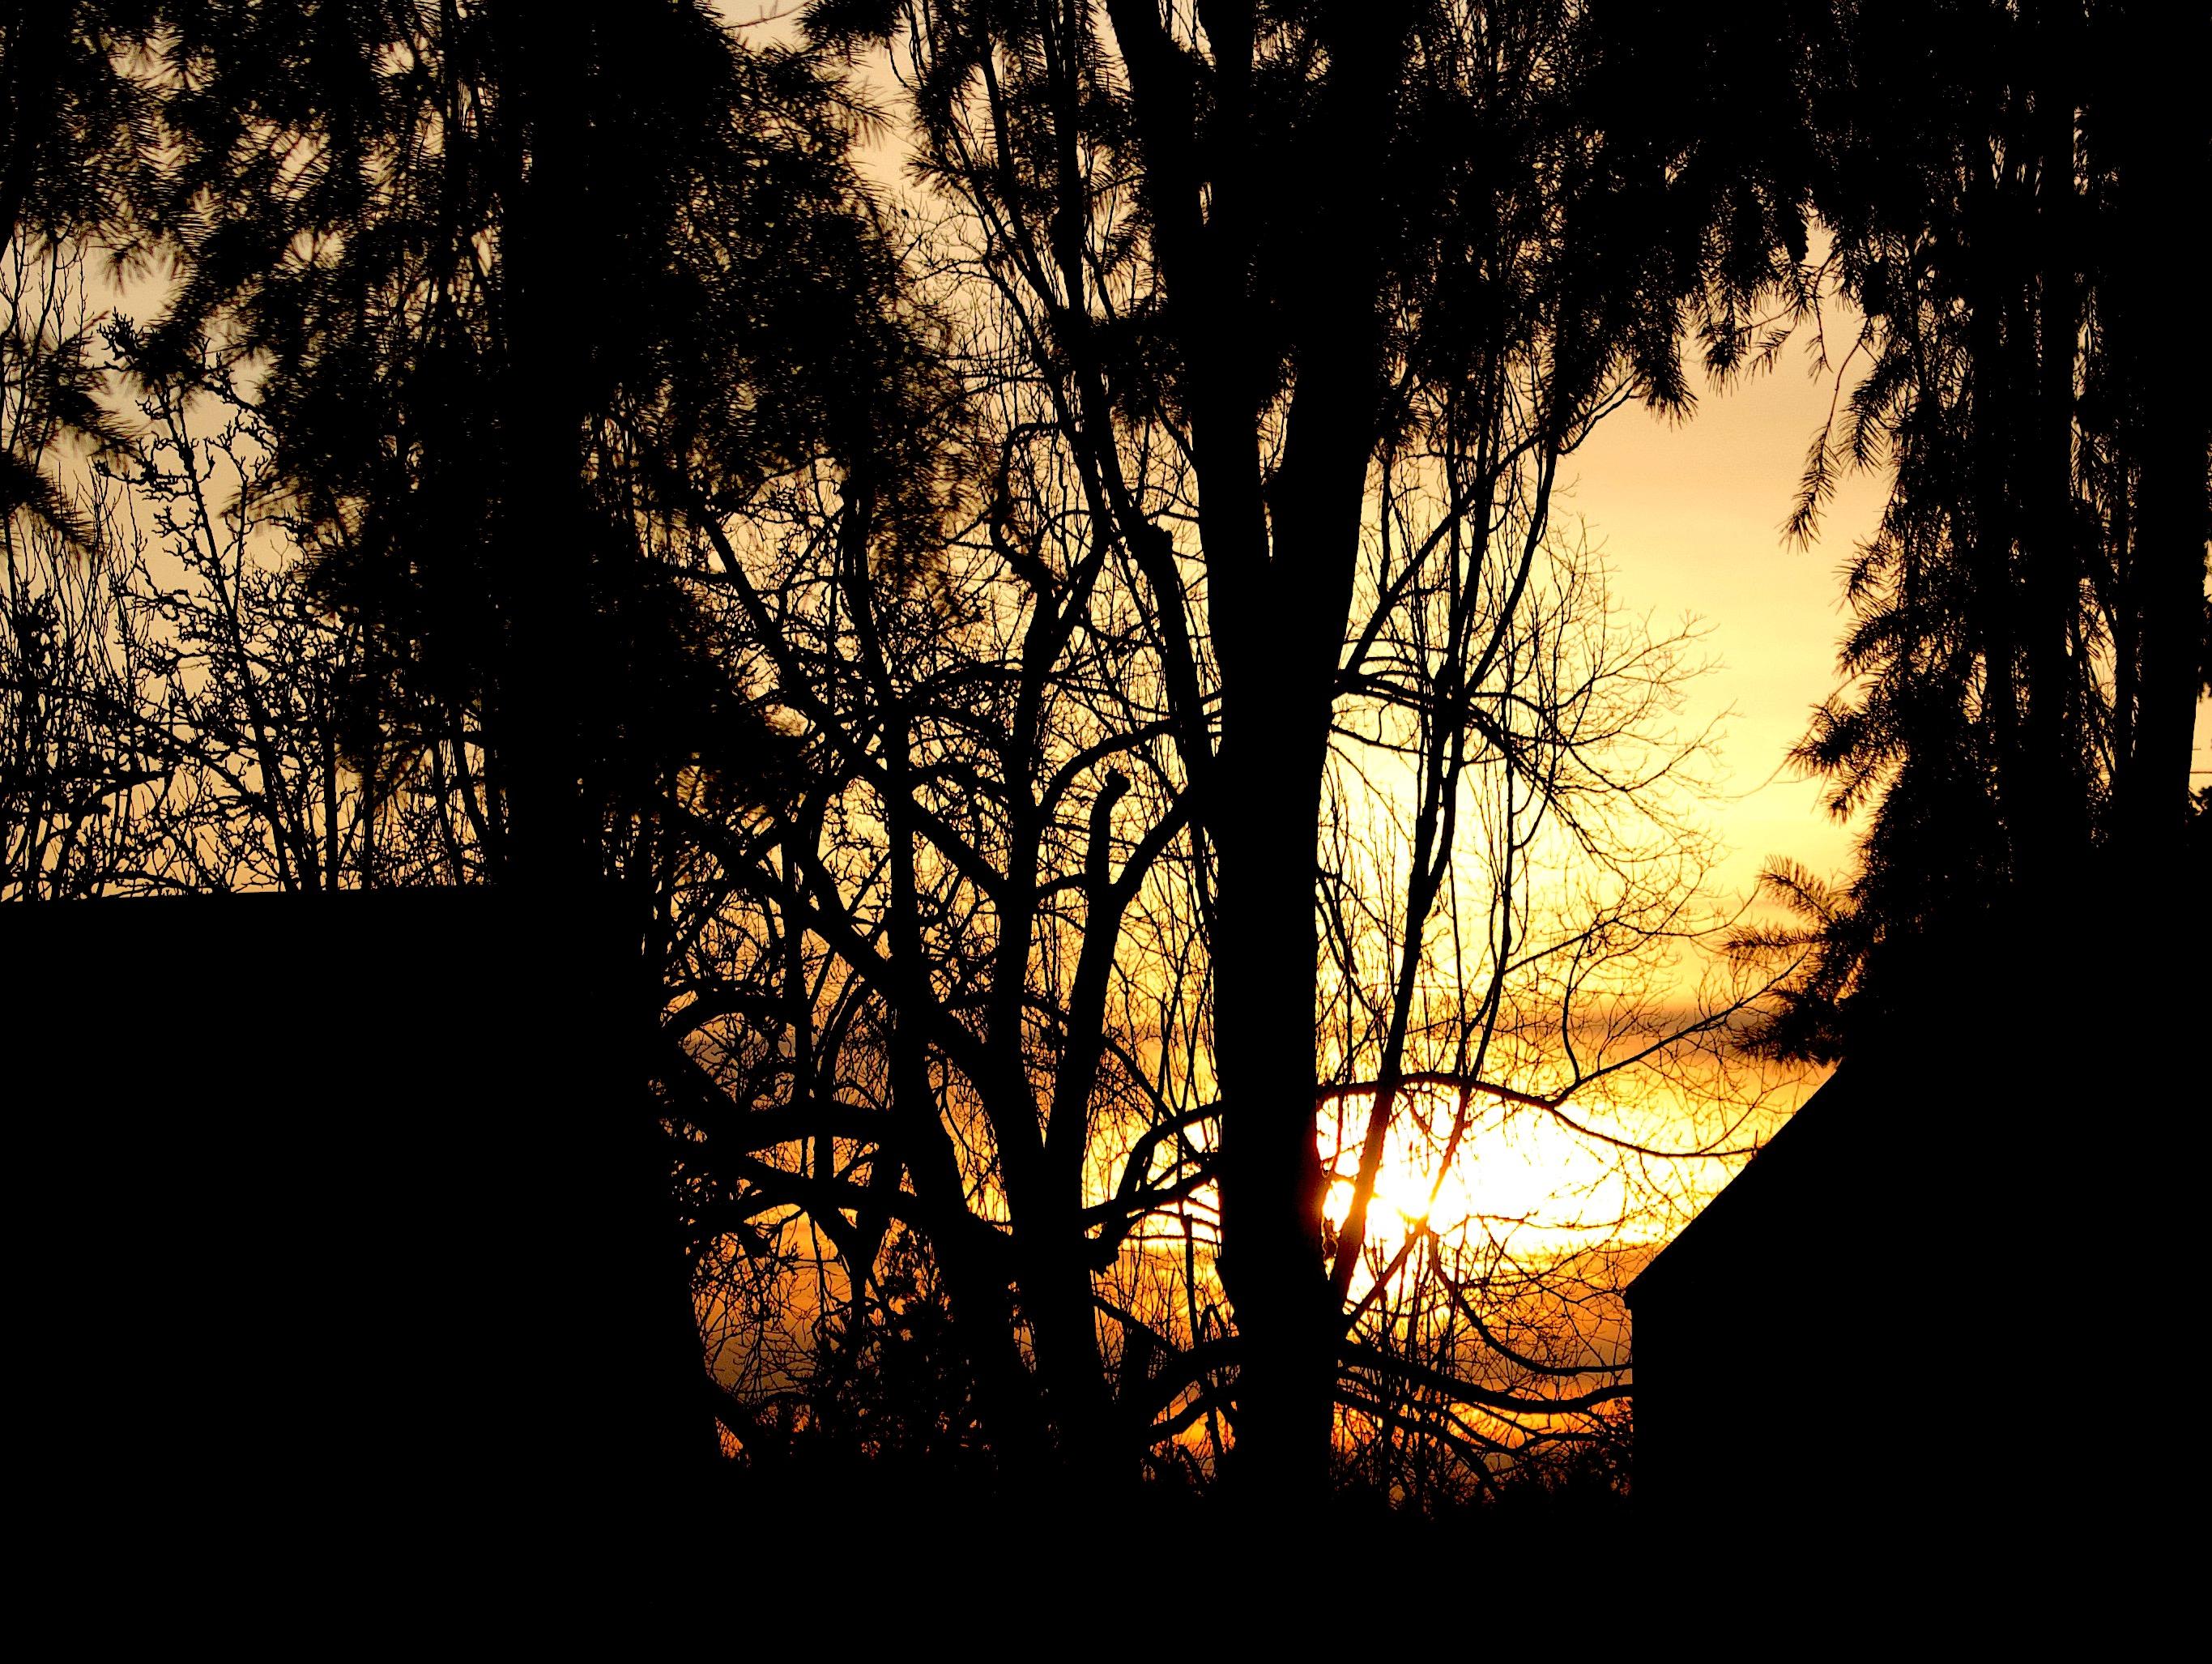 sunset219183